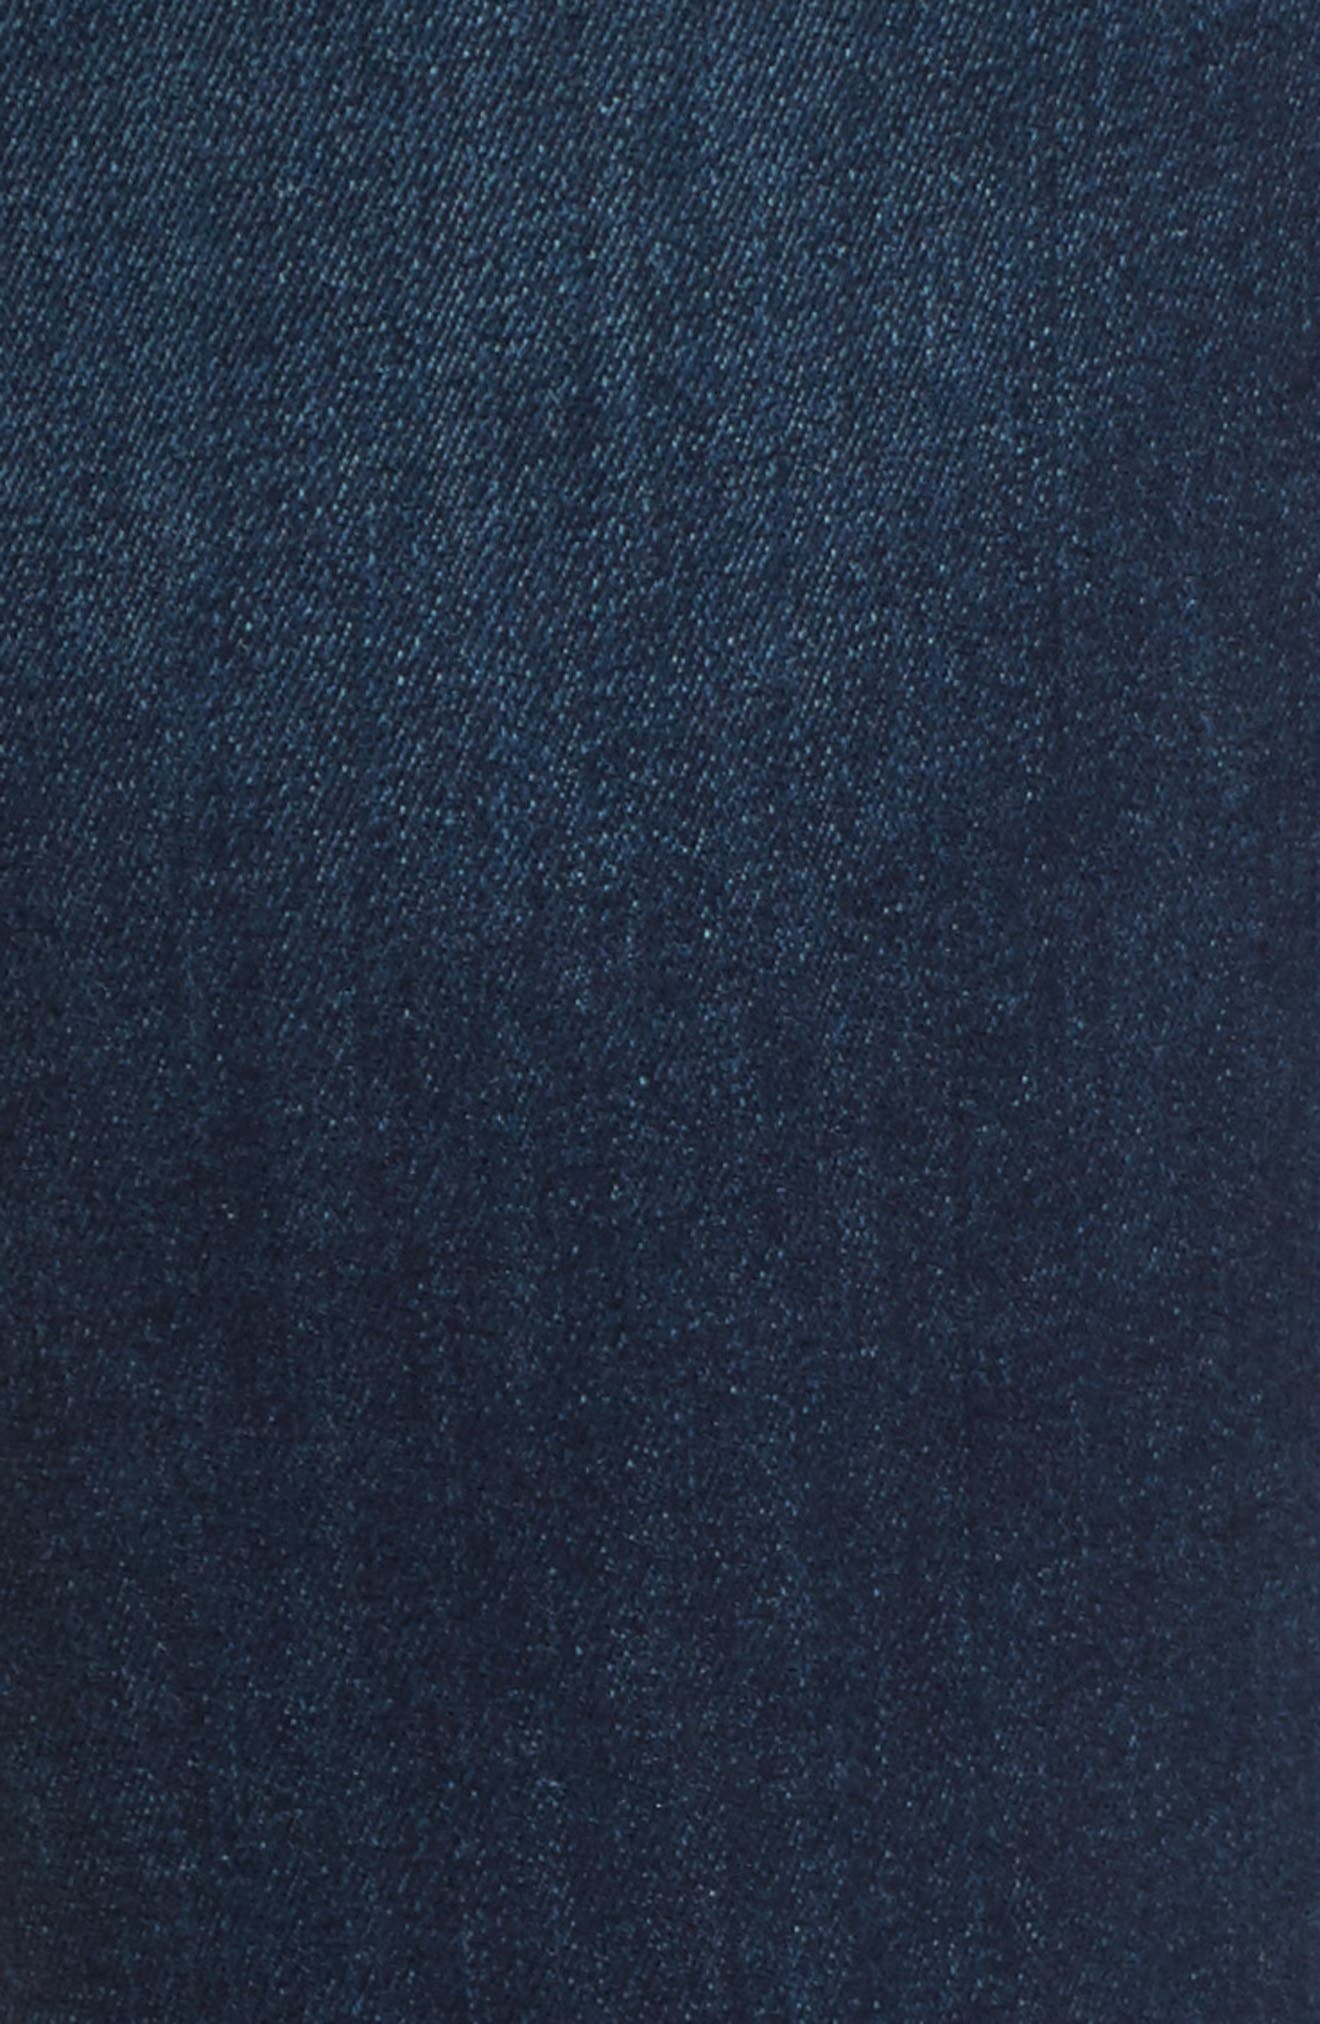 Mara Maternity Ankle Jeans,                             Alternate thumbnail 5, color,                             405